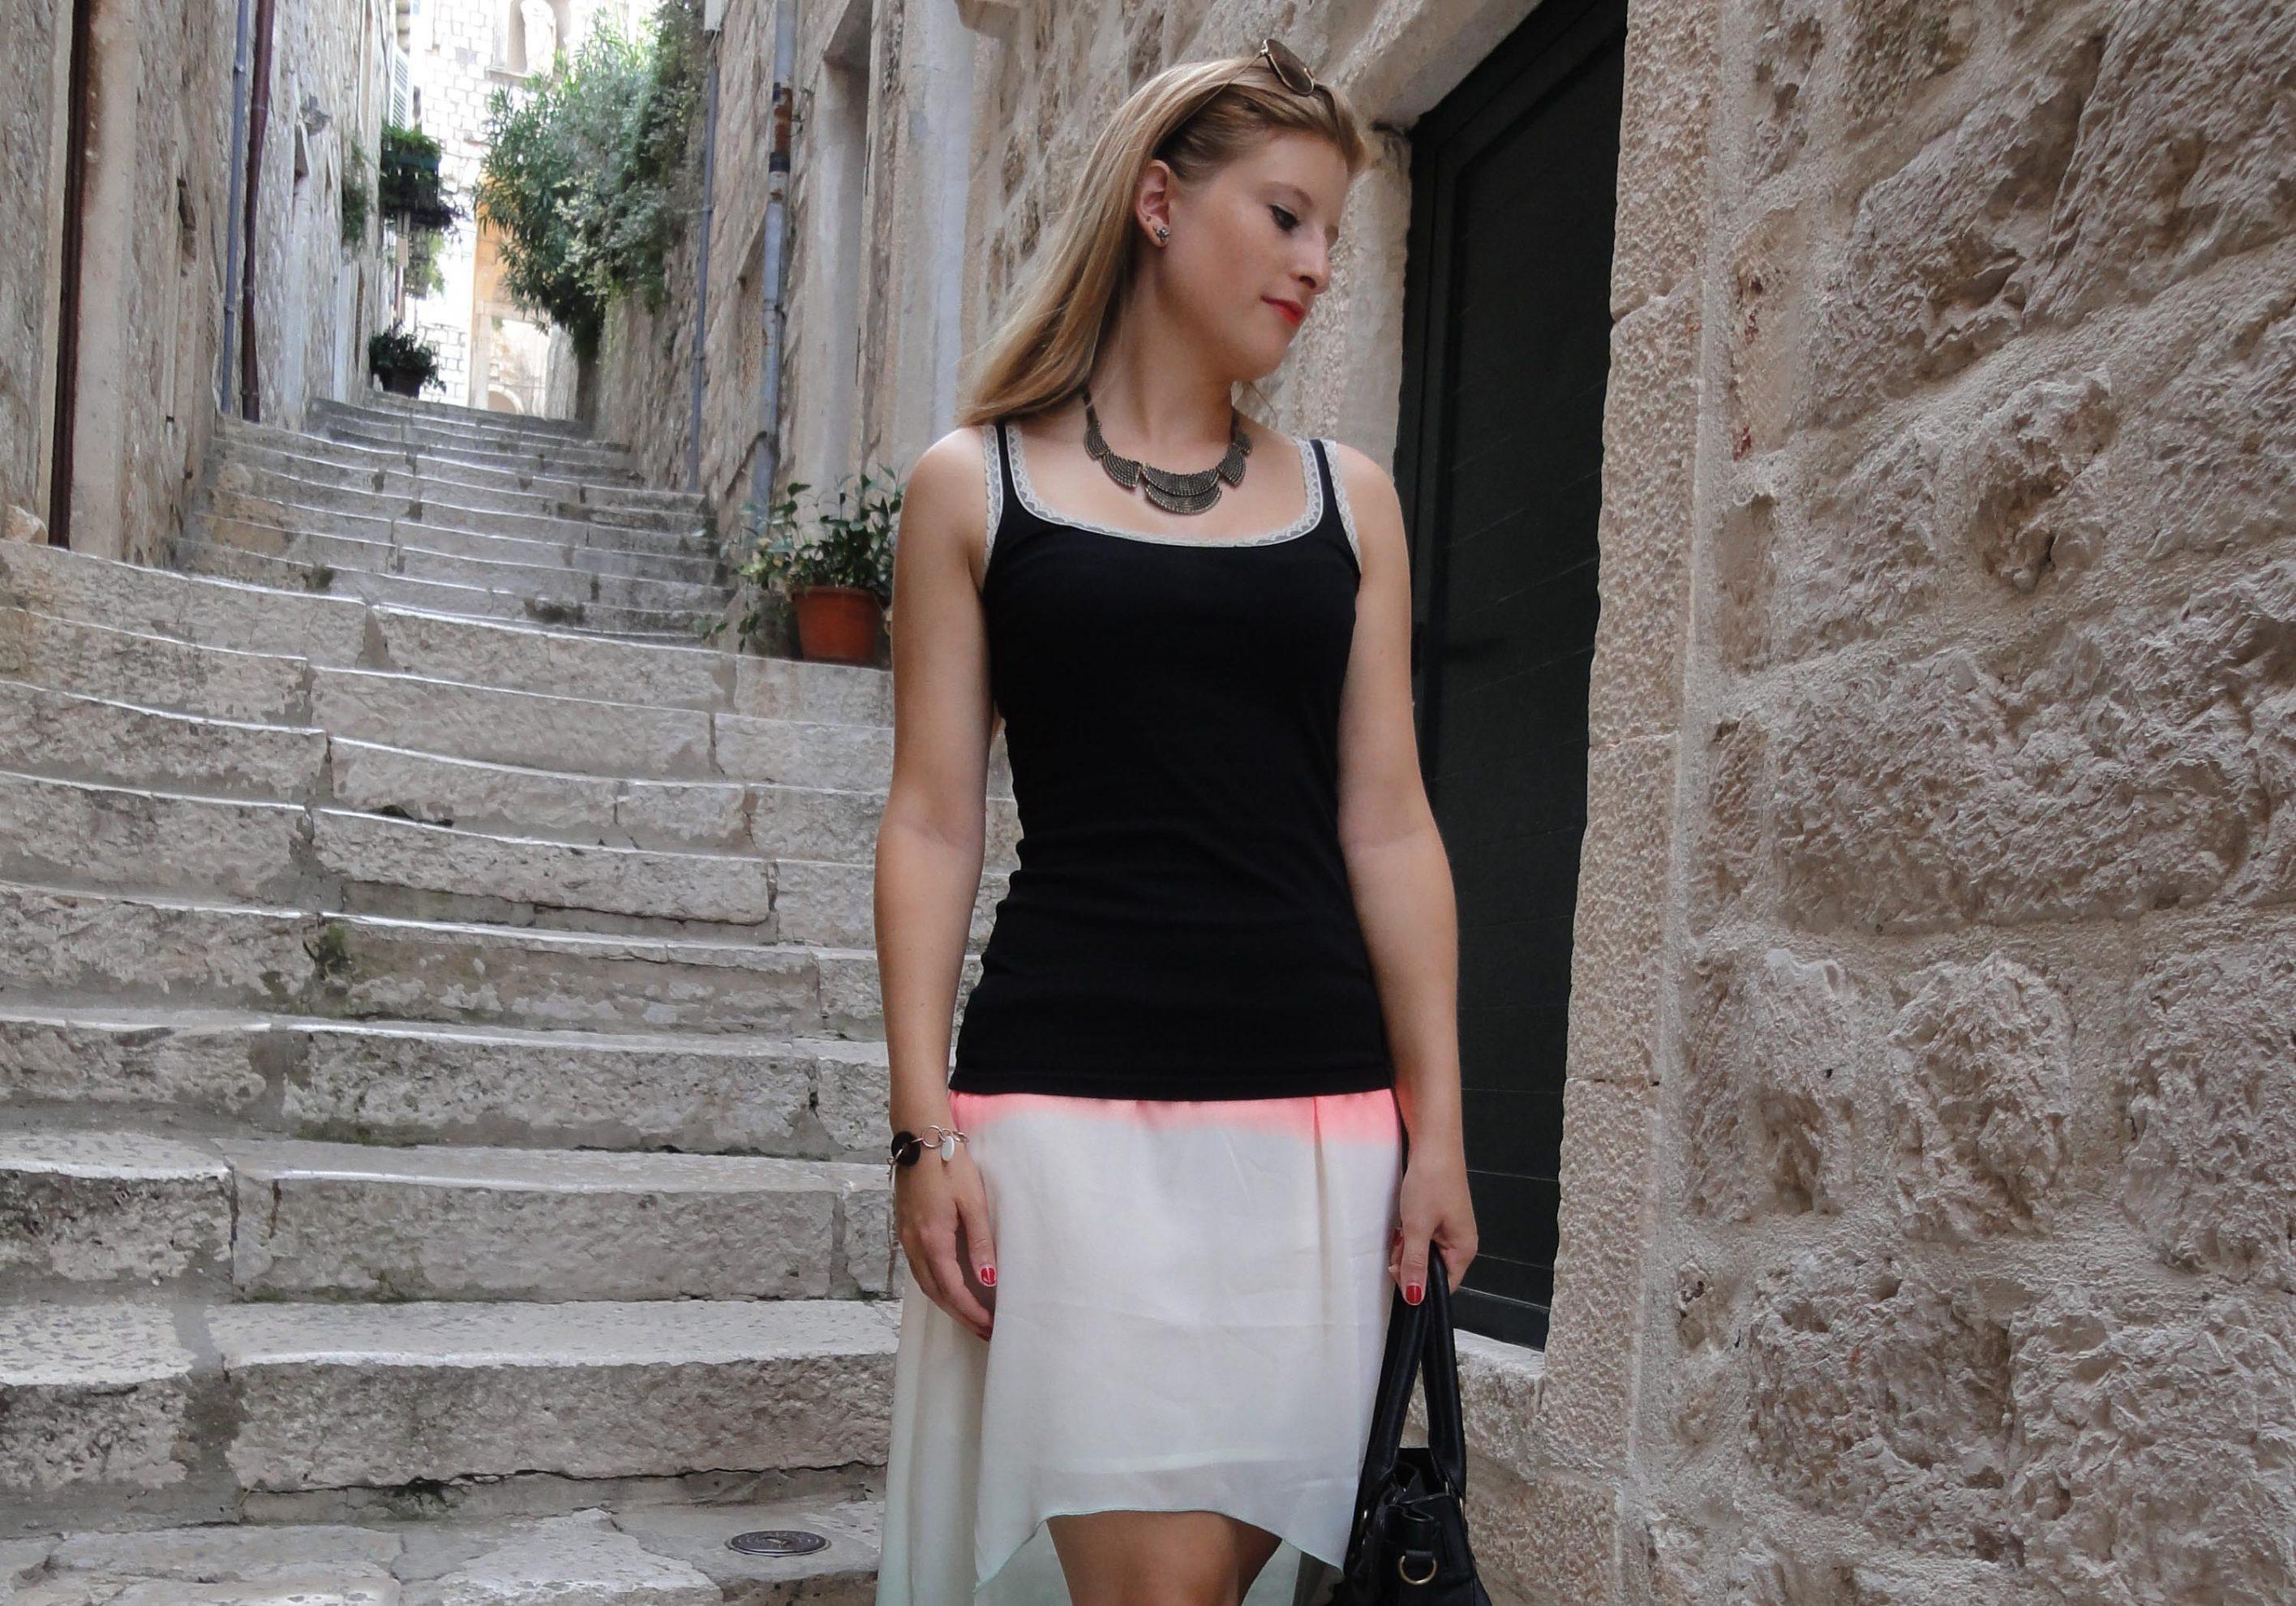 Mullet Skirt Vokuhila Rock kombinieren Sommeroutfit Fashion Look Dubrovnik Pilotensonnenbrille Modeblog 5